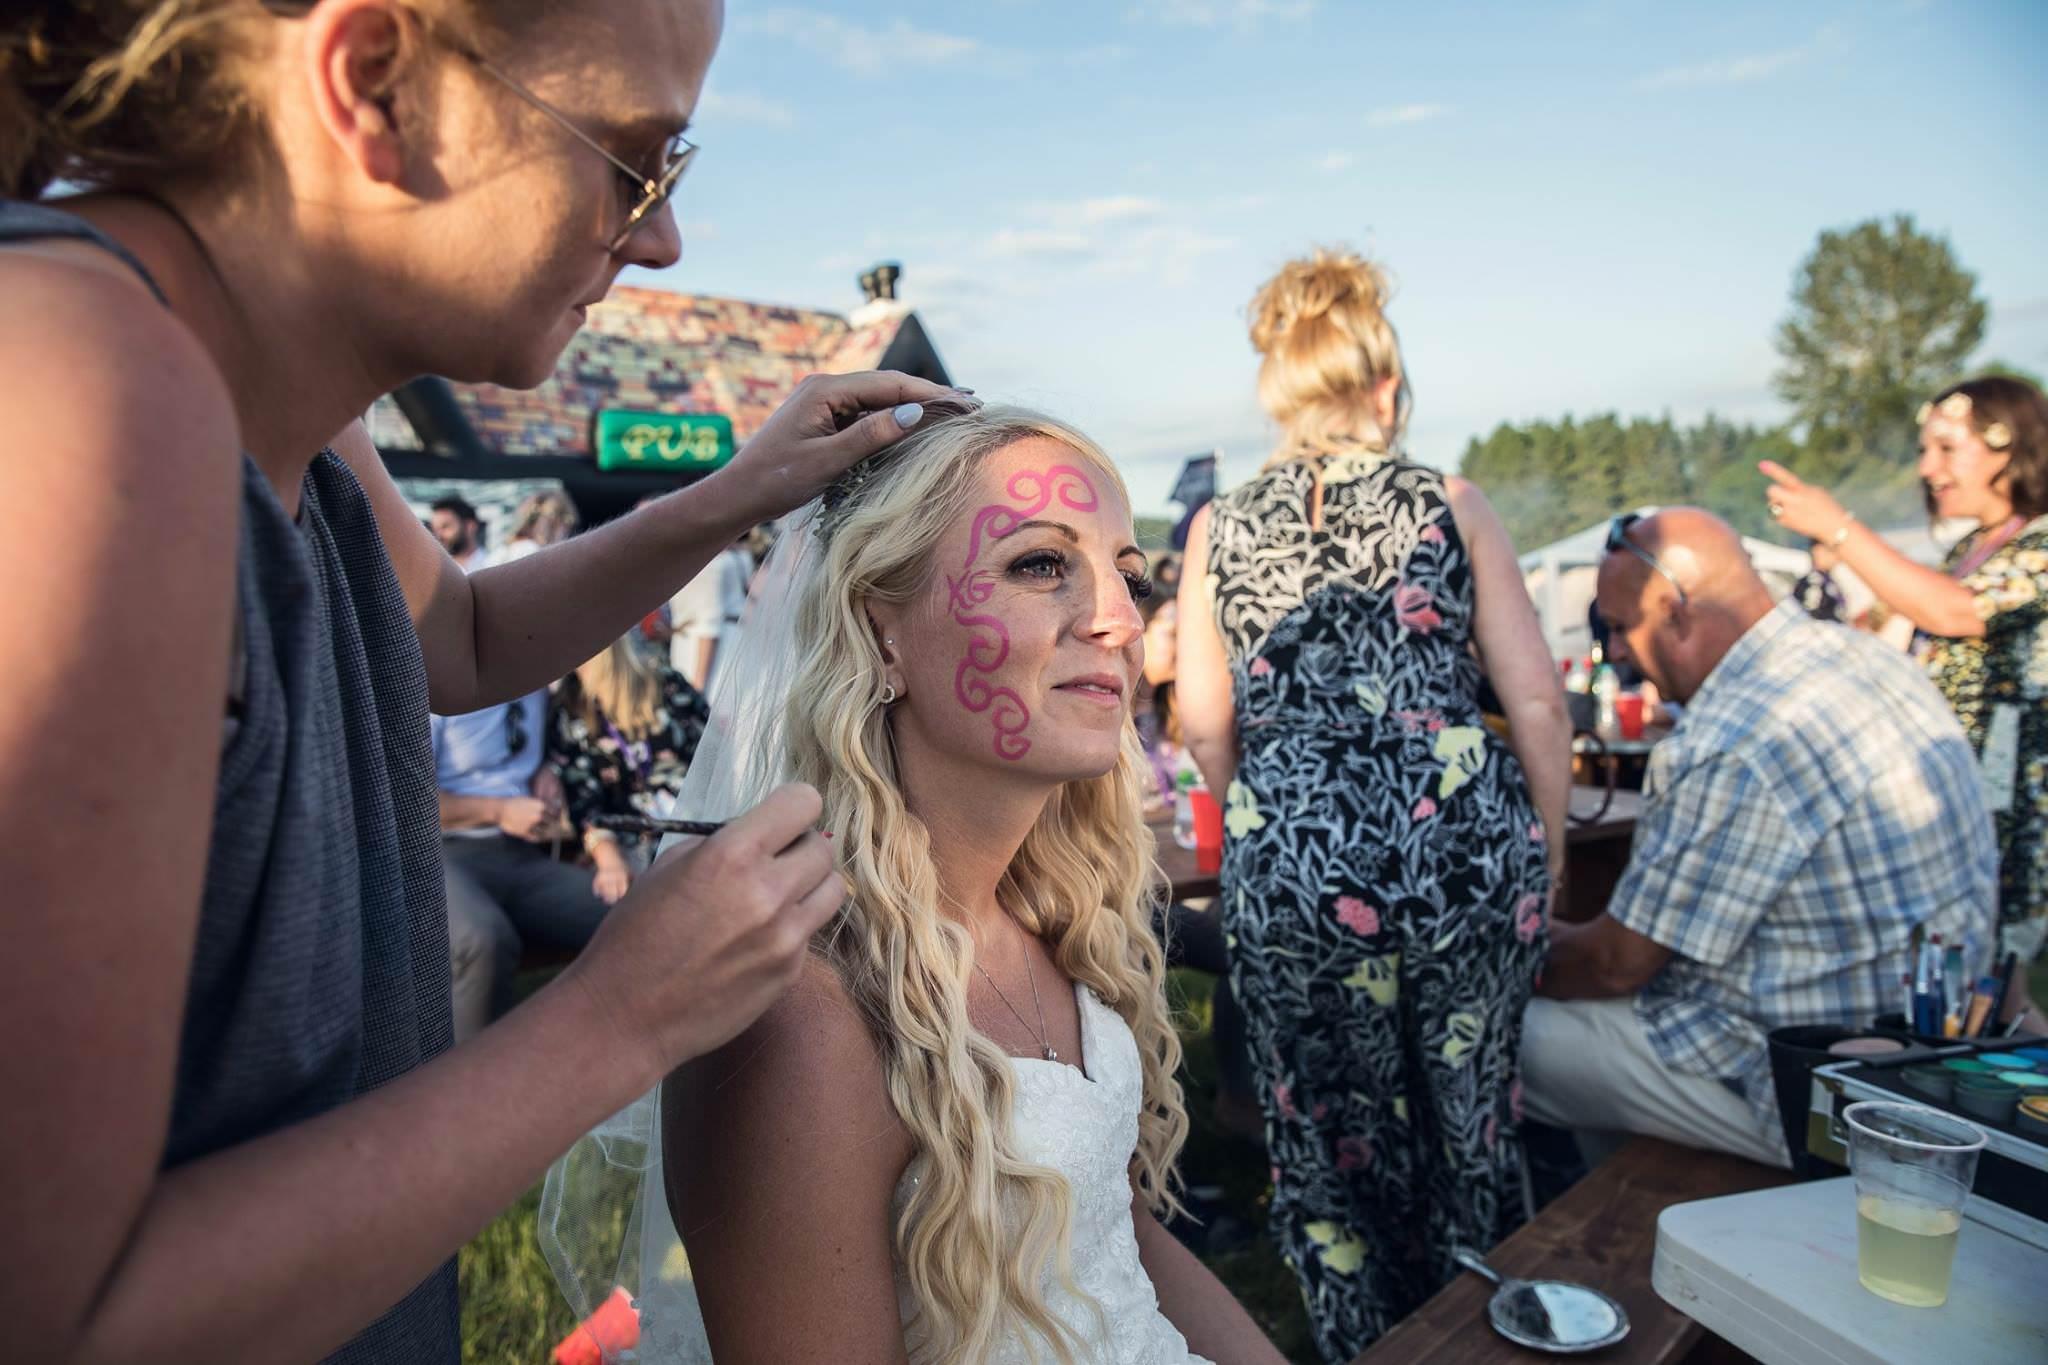 bride having festival face paint at her festival wedding fiesta fields